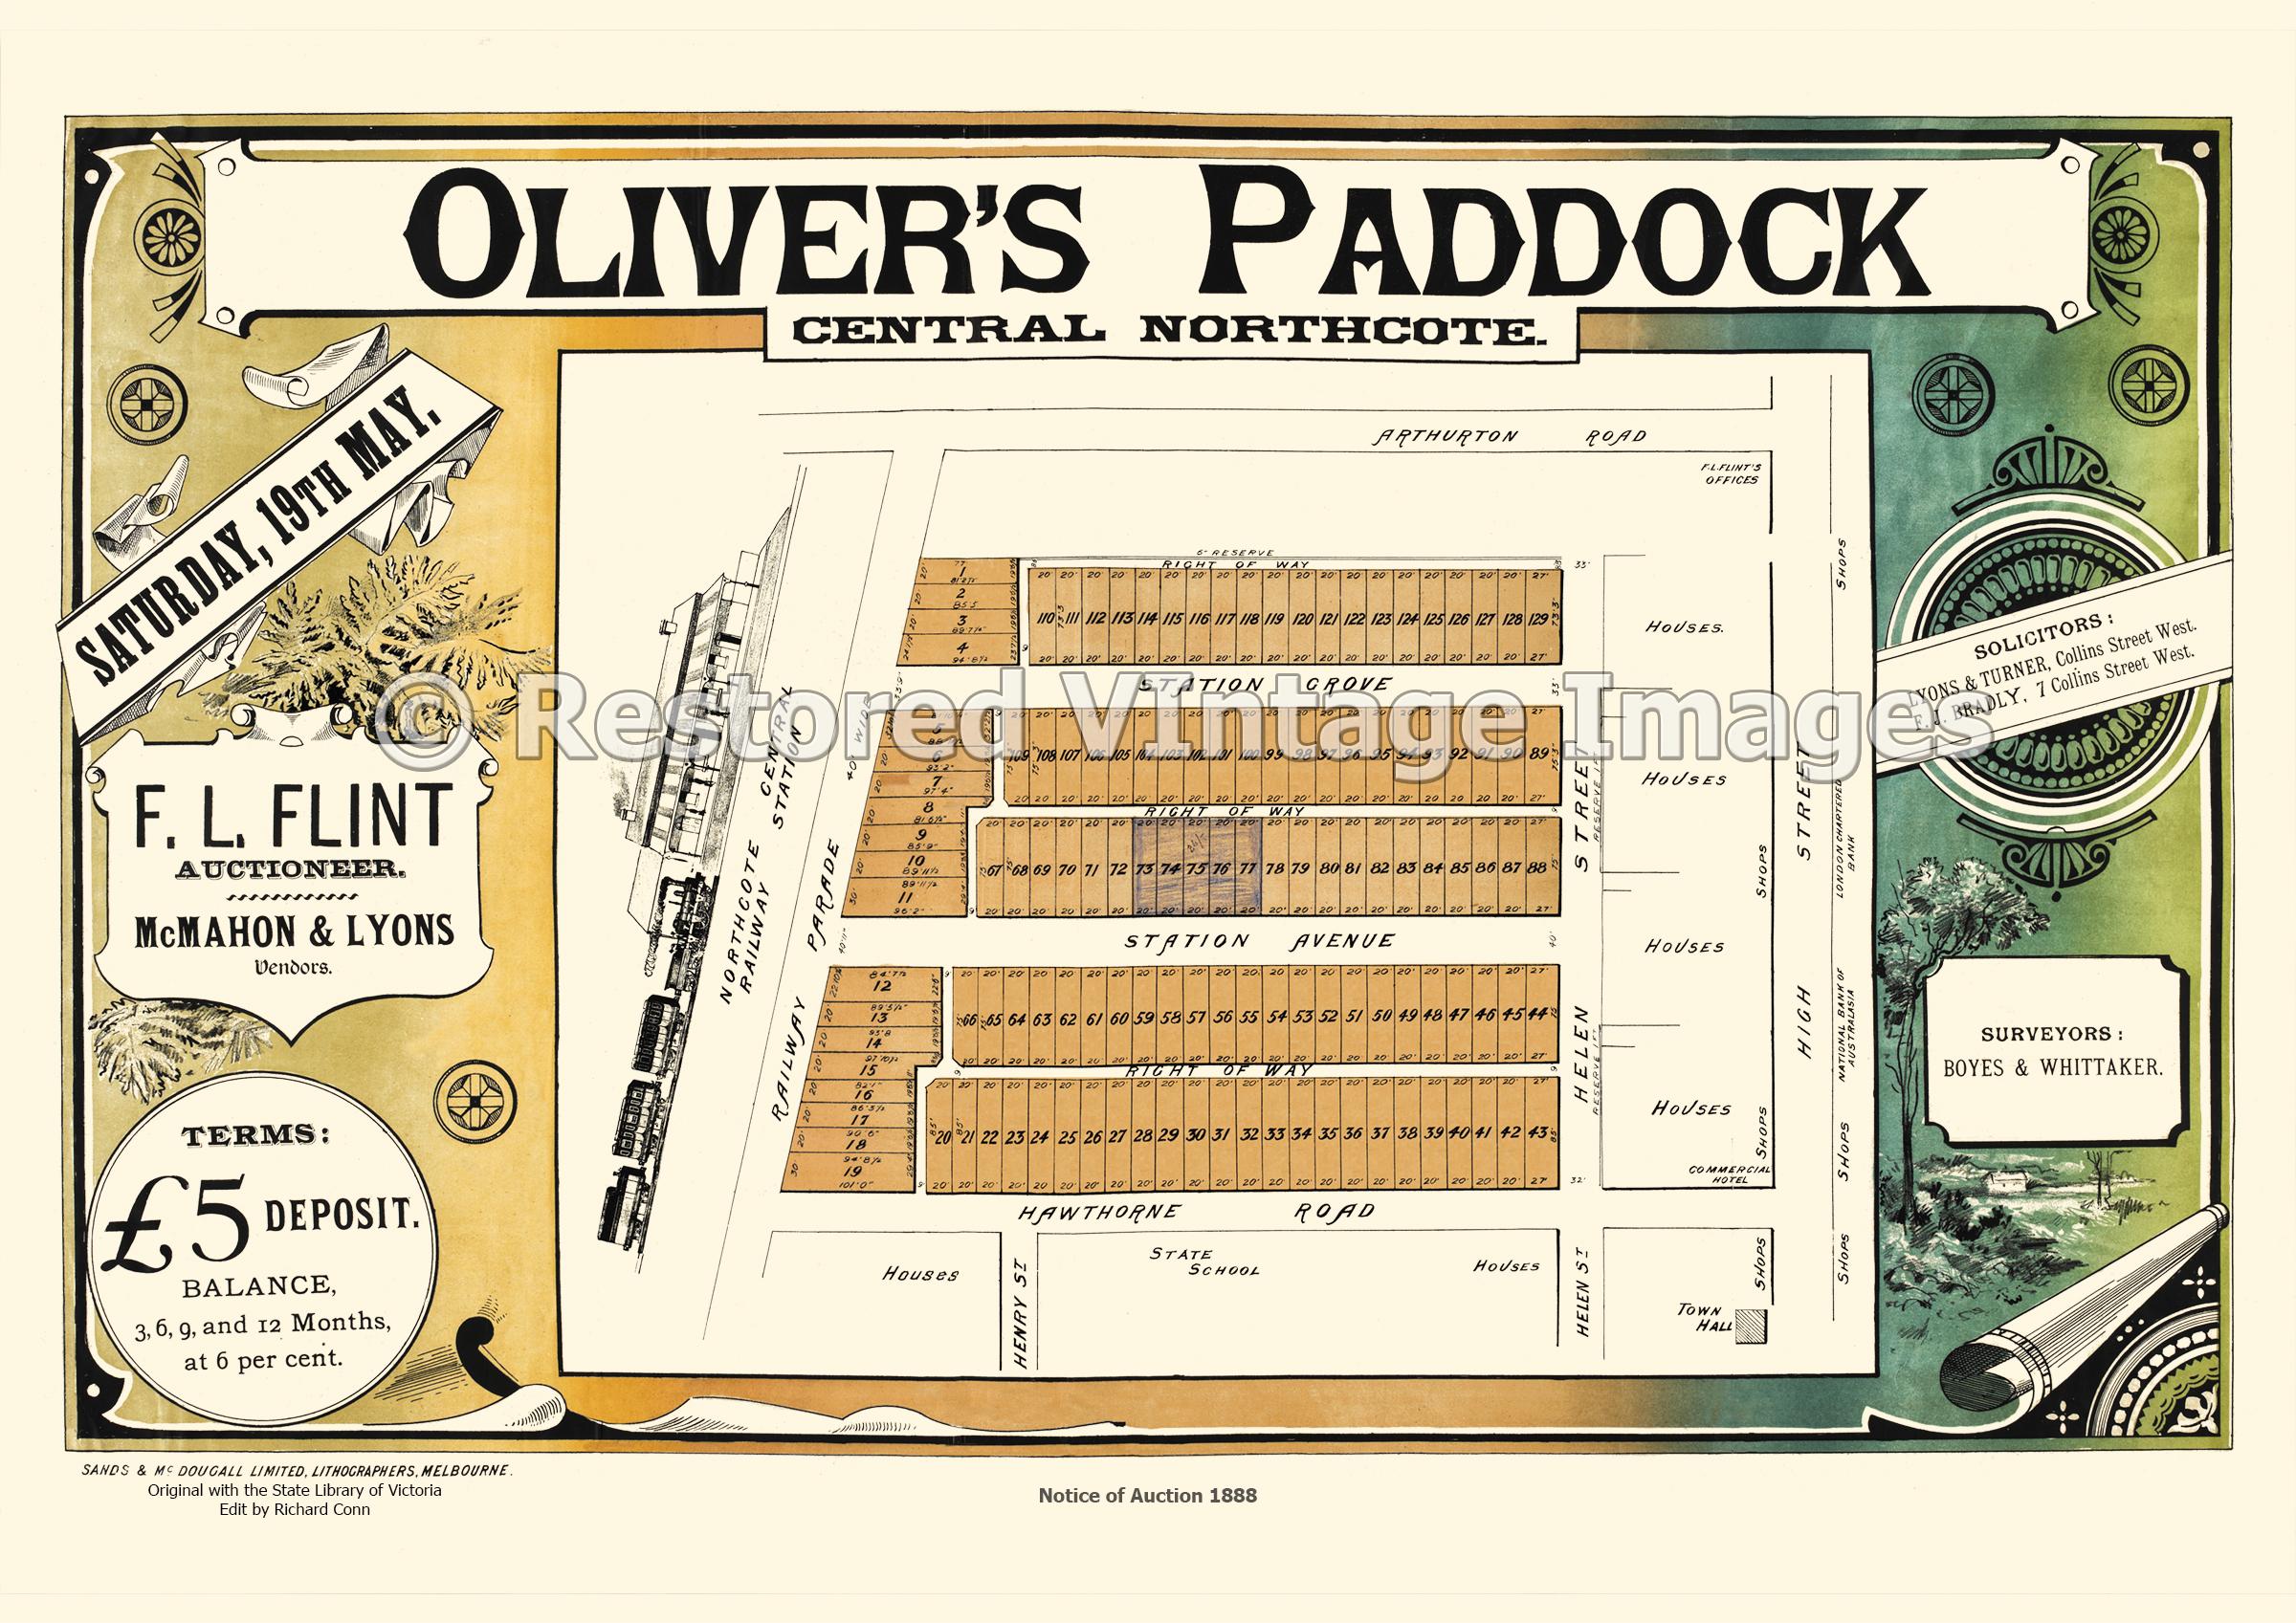 Oliver's Paddock Central Northcote 1888 – Northcote